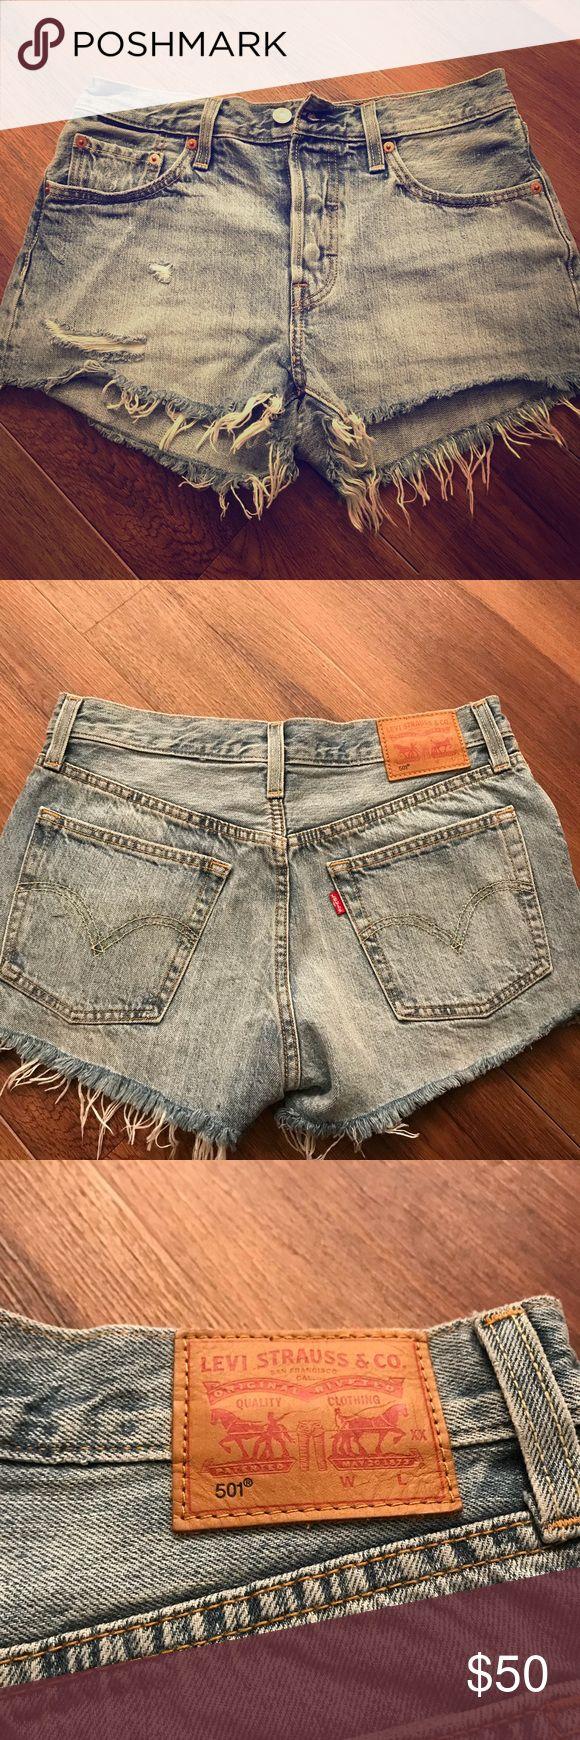 "Levi's 501 Denim Cutoff Shorts Levi's 501 cutoff denim jean shorts. Size 27. Waist measures 15"" lying flat. 11"" length. Super cute! Bought from boutique. Not homemade. Levi's Shorts Jean Shorts"